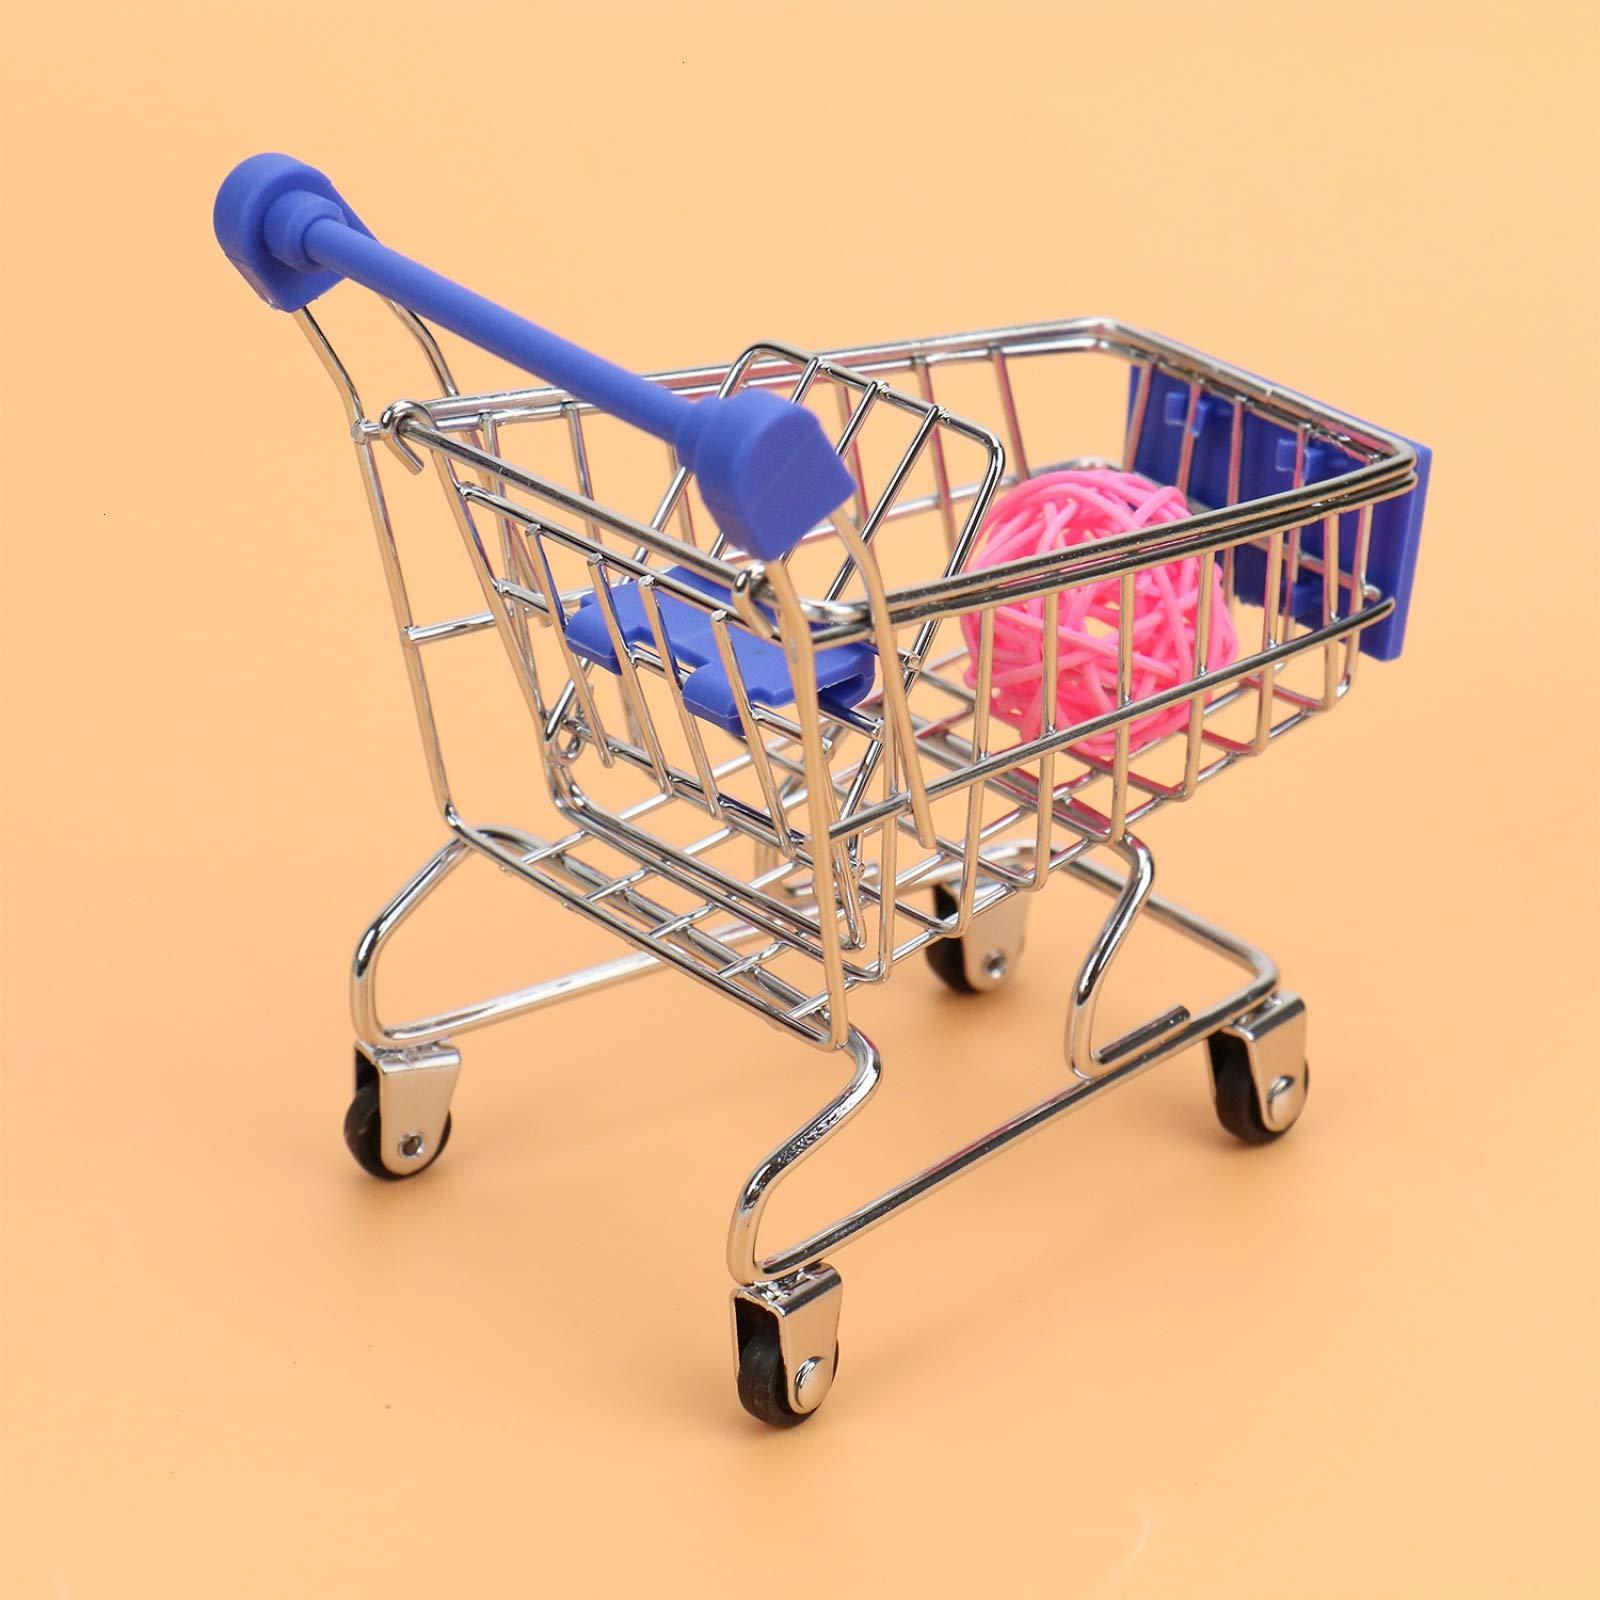 WSSROGY 3 Pack Mini Supermarket Handcart Cart Mode Storage Toy Table Office Novelty Decoration by WSSROGY (Image #2)